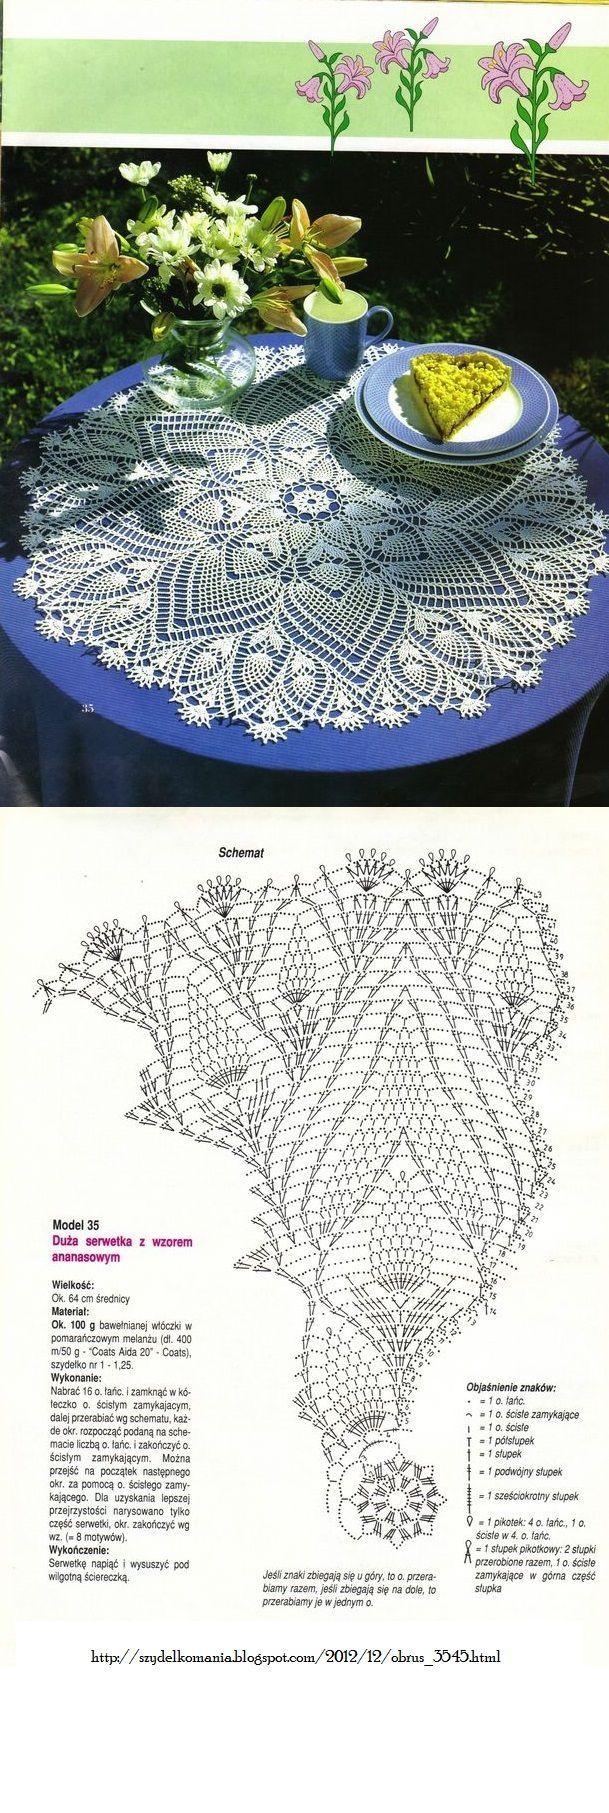 #_SUE Crochet Doily with diagram.                                                                                                                                                                                                                                                                                           15 repins                                                                                                             2 likes